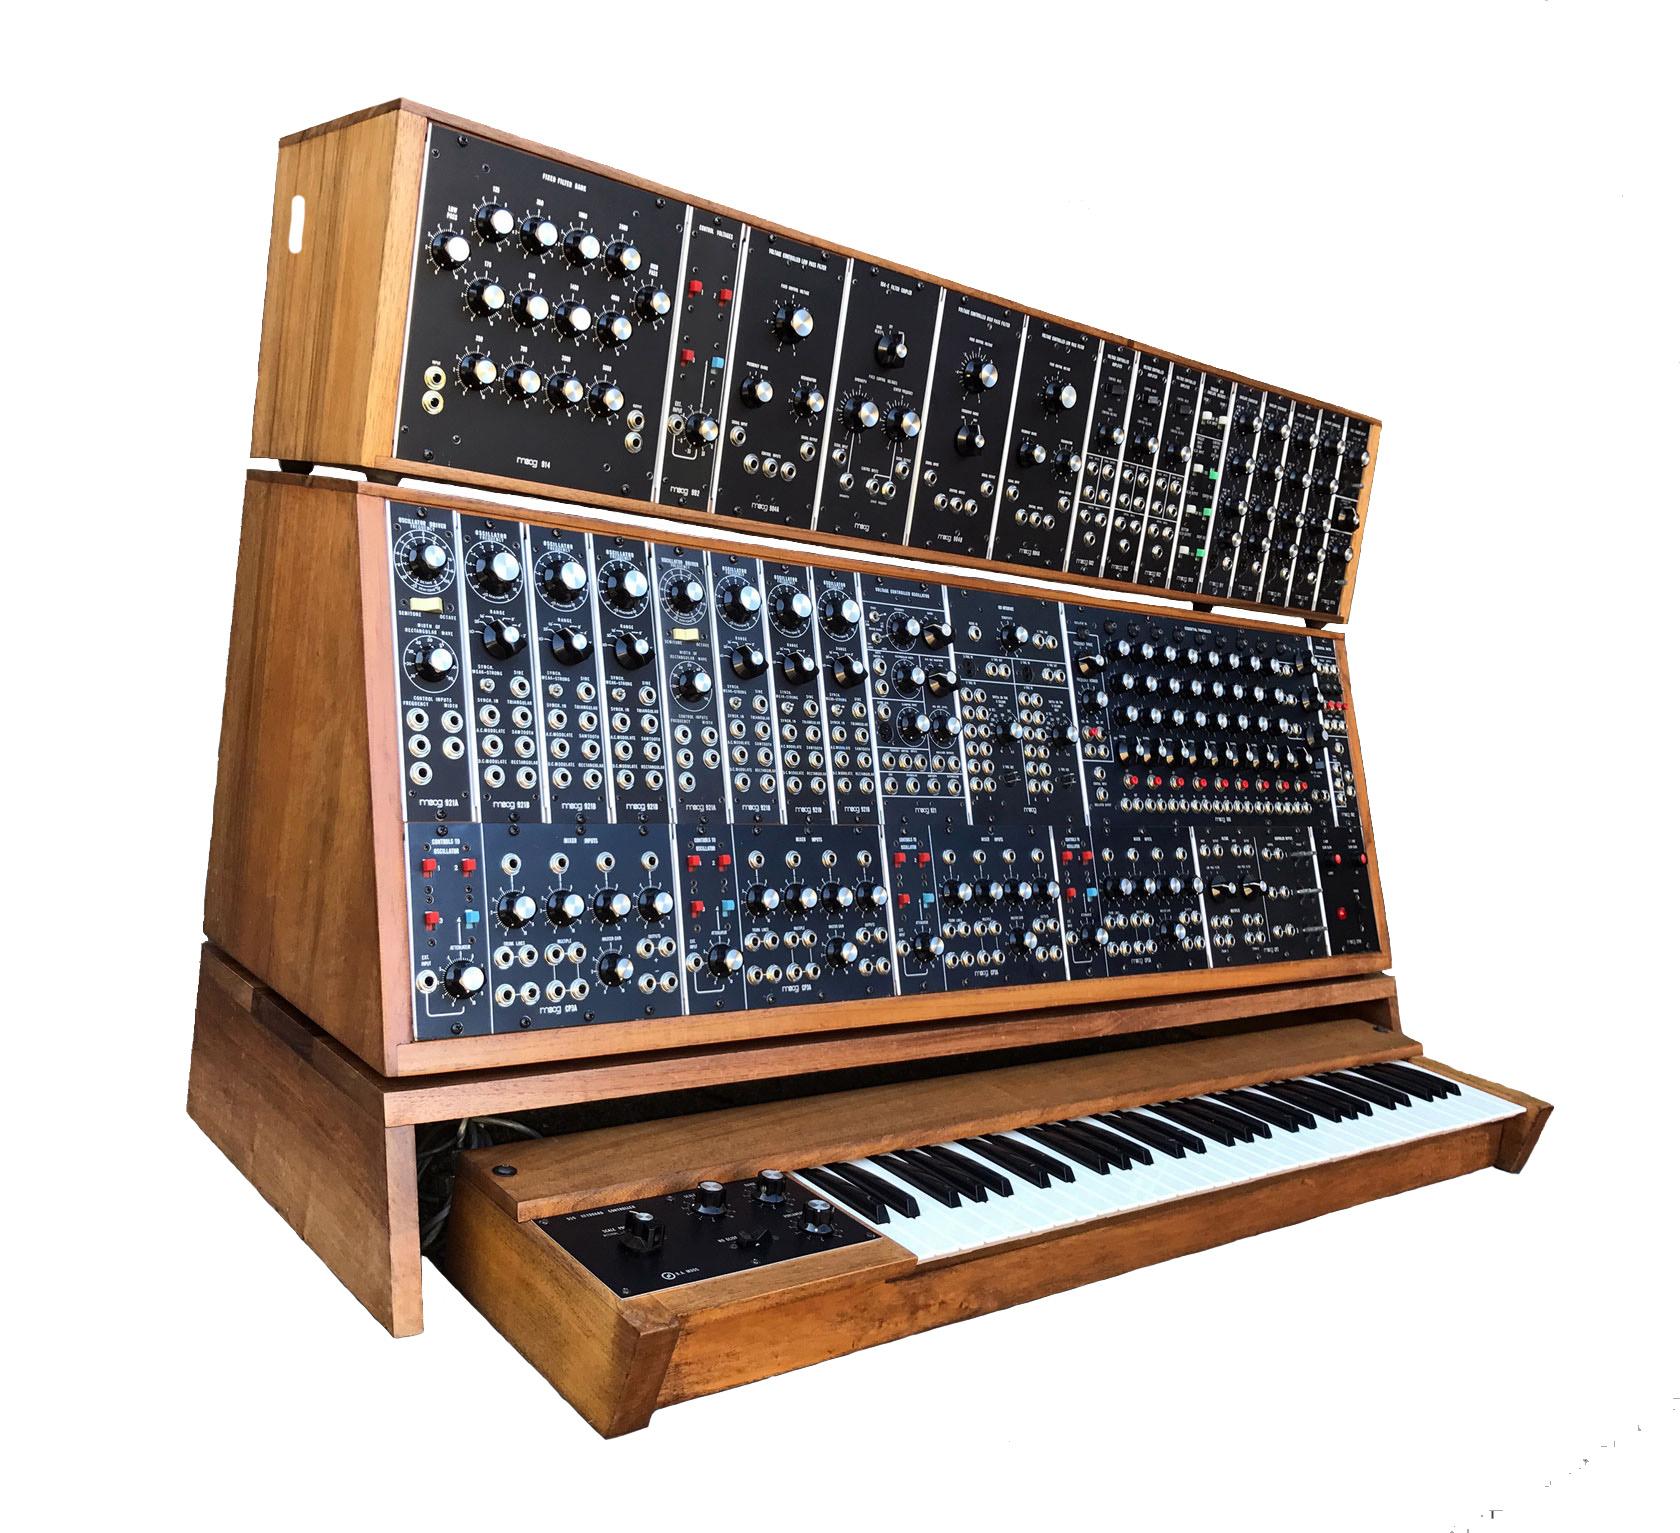 breve historia sintetizadores 1fondo blanco - Breve Historia de los Sintetizadores